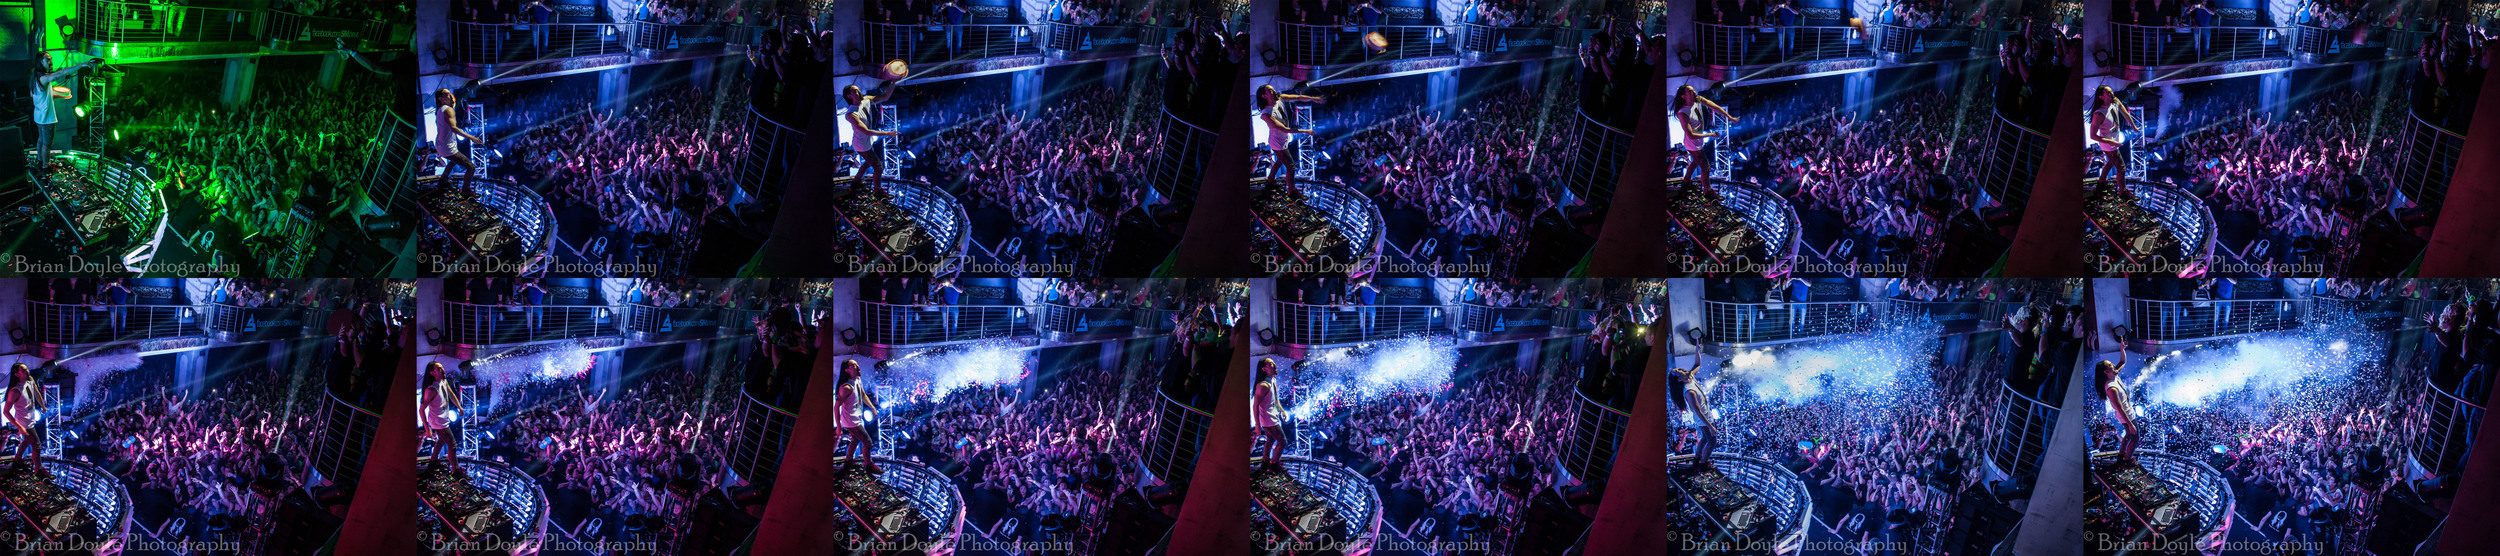 Aokify America Tour Caked-1.jpg